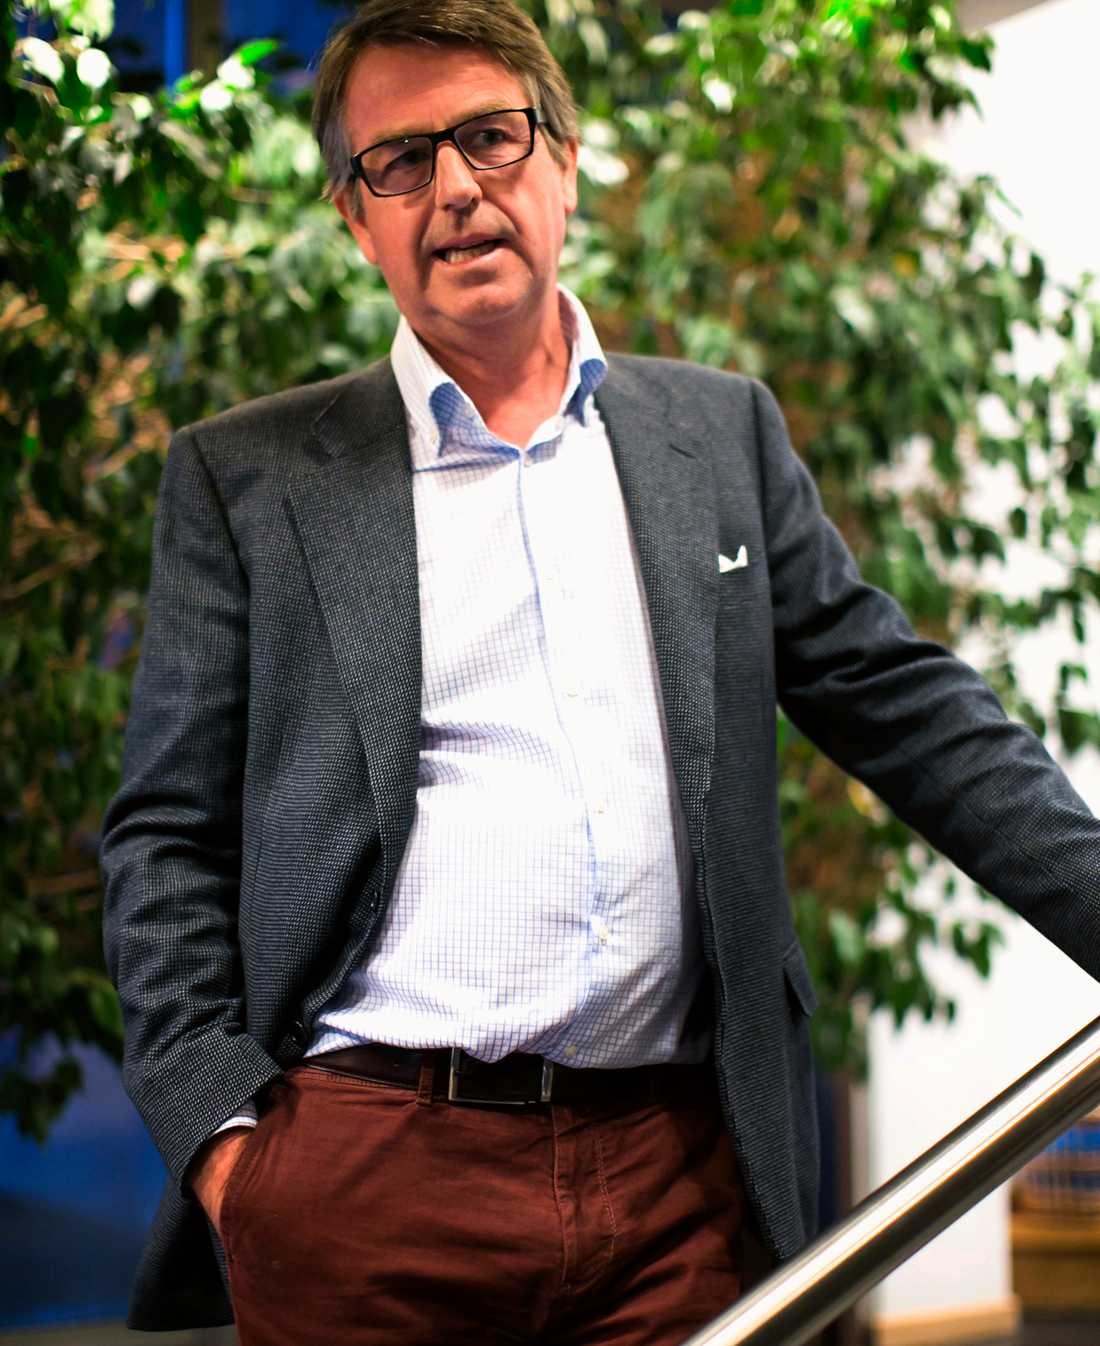 Företaget Dafgårds vd Ulf Dafgård.